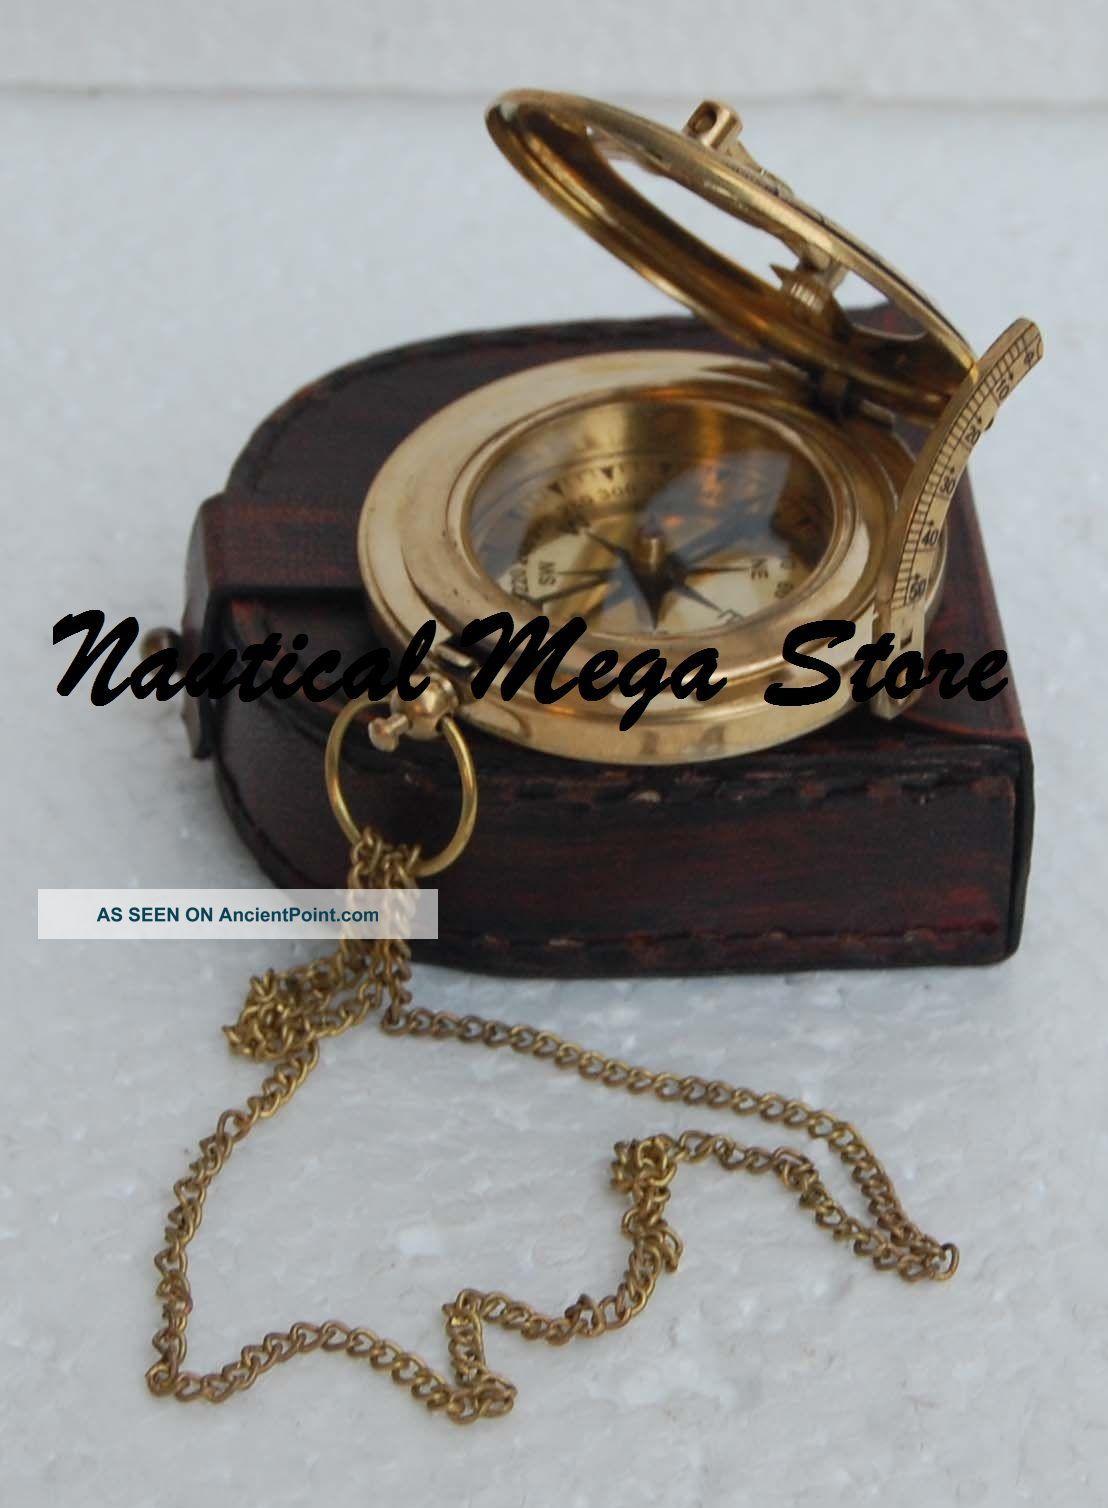 Brass Polish Antique Brass Sundial Compass Vintage Push Nautical Button Decor Compasses photo